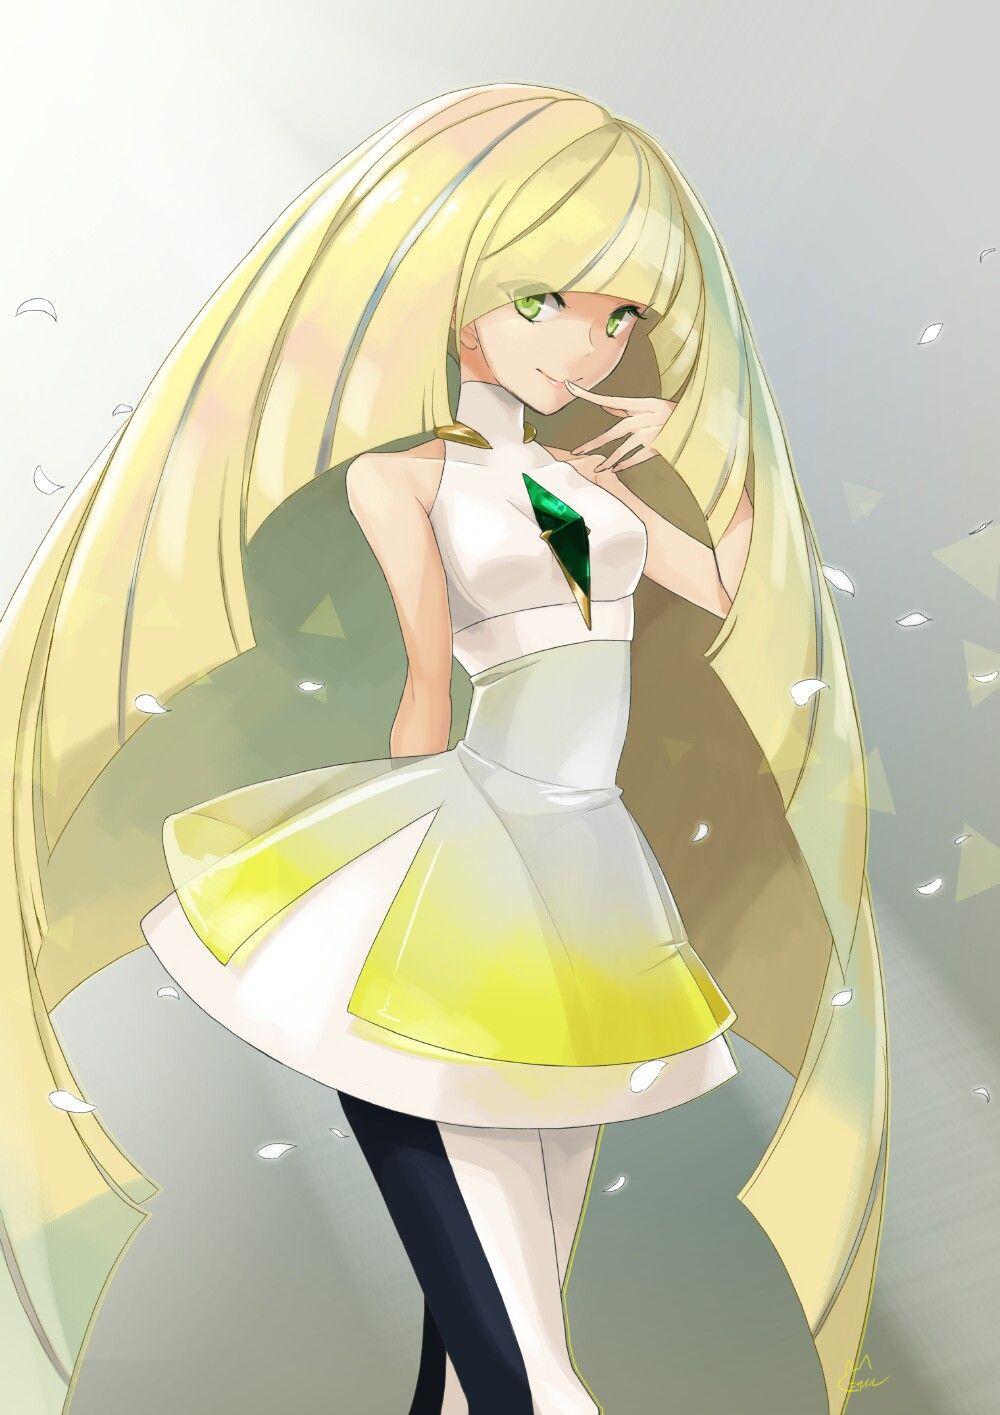 Lusamine Pokemon Personajes Personajes De Anime Lusamine Pokemon